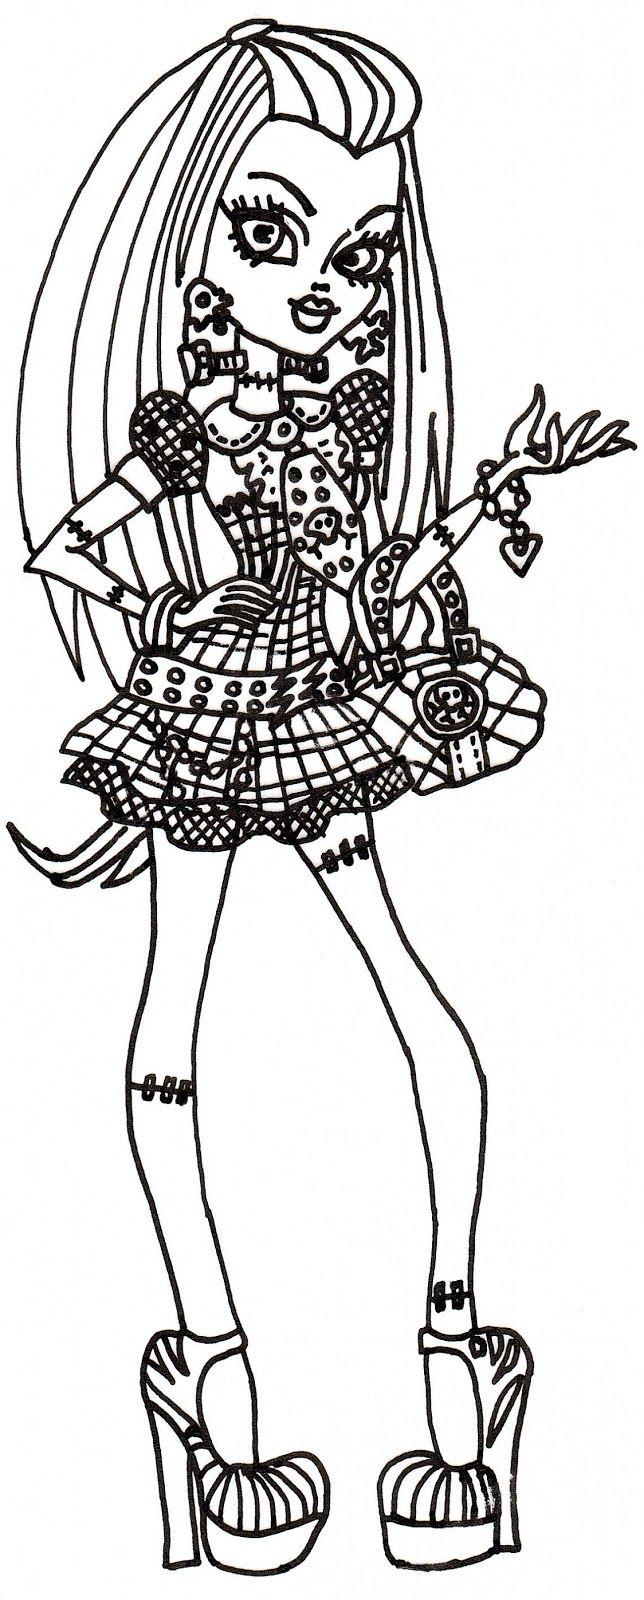 frankie+stein.PNG (644×1600) | 2 Color * Monster High | Pinterest ...